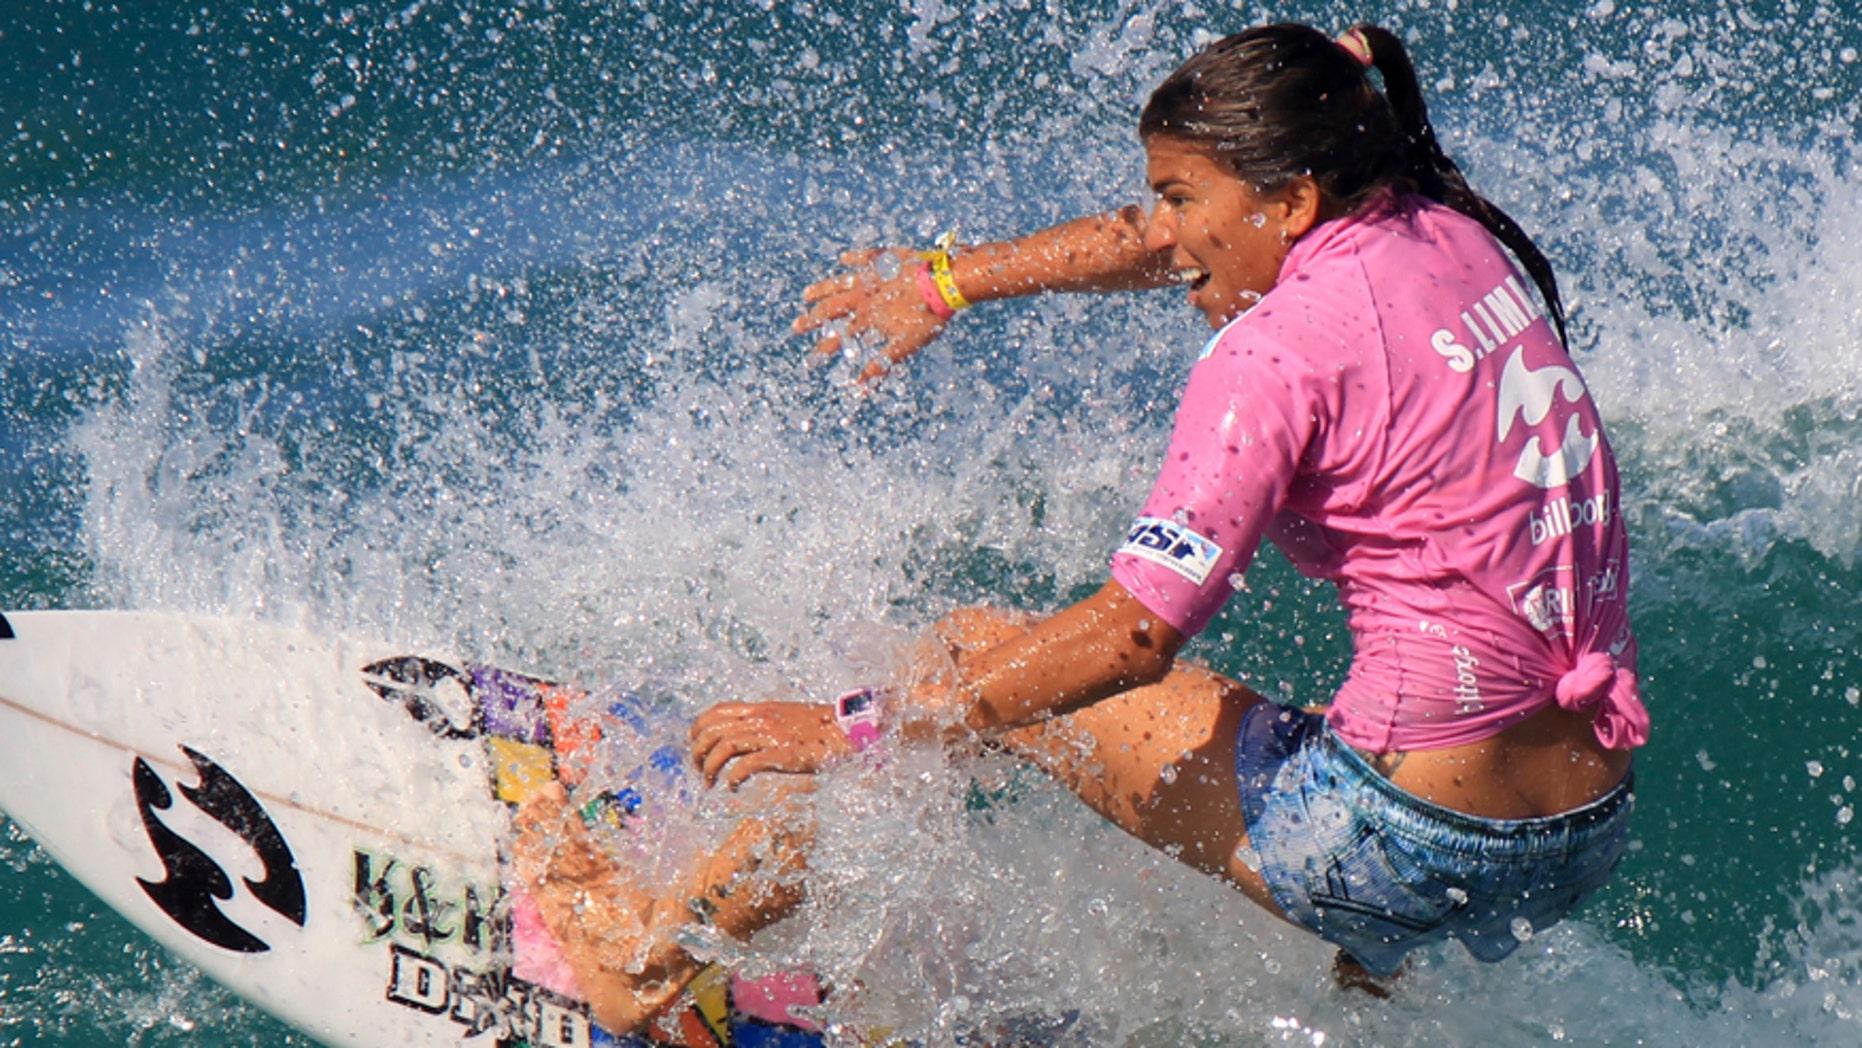 Silvana Lima of Brazil surfs during the women's Association of Surfing Professionals (ASP) Billabong Rio Pro championship on Barra da Tijuca beach in Rio de Janeiro May 15, 2011.  REUTERS/Sergio Moraes (BRAZIL - Tags: SPORT) - RTR2MFZF